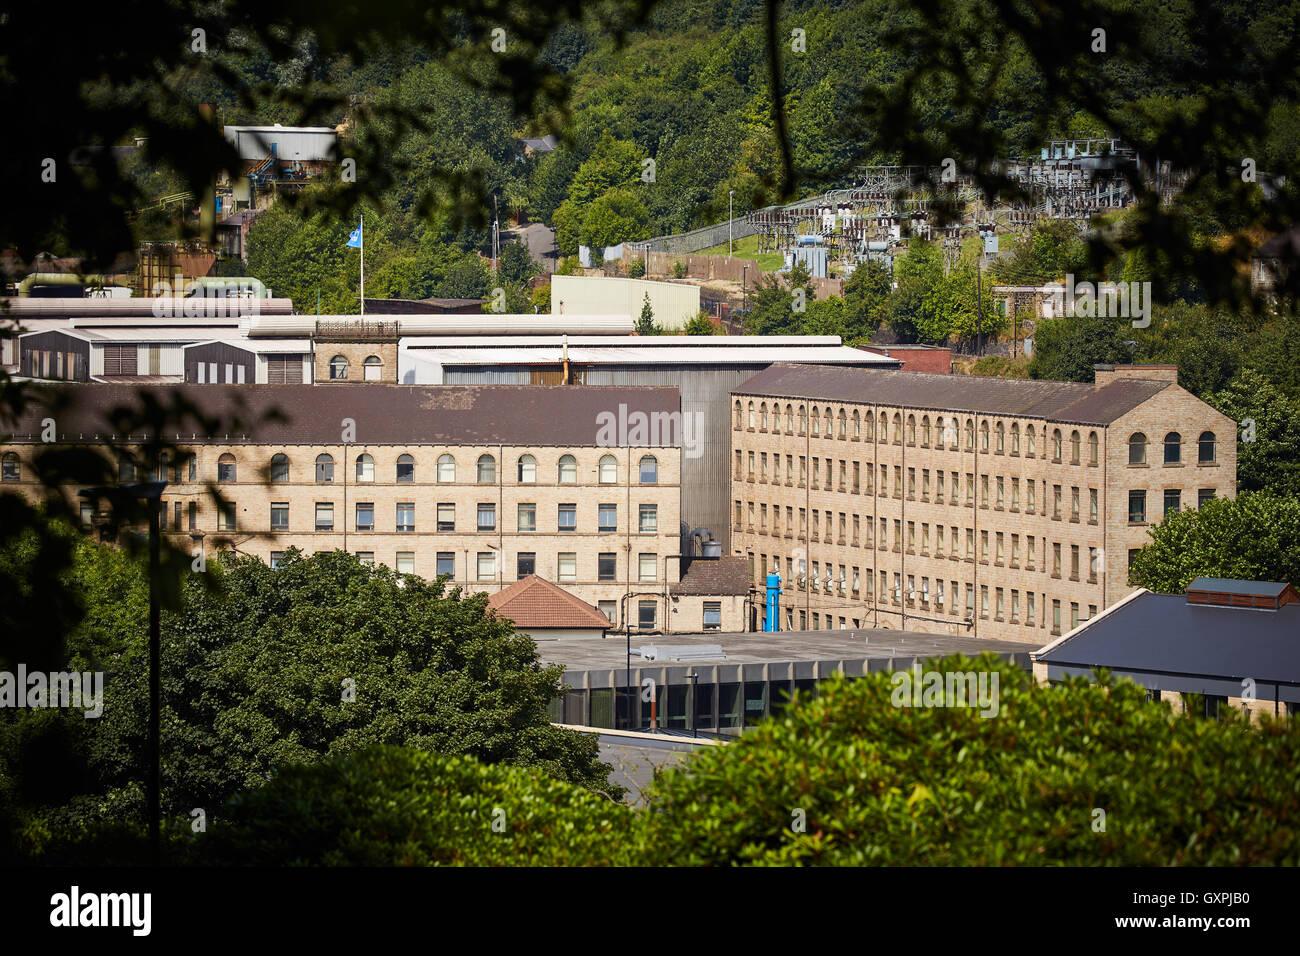 Stockbridge tata Steel works mills   valley warehouse store buildings architecture originally cotton mills site - Stock Image